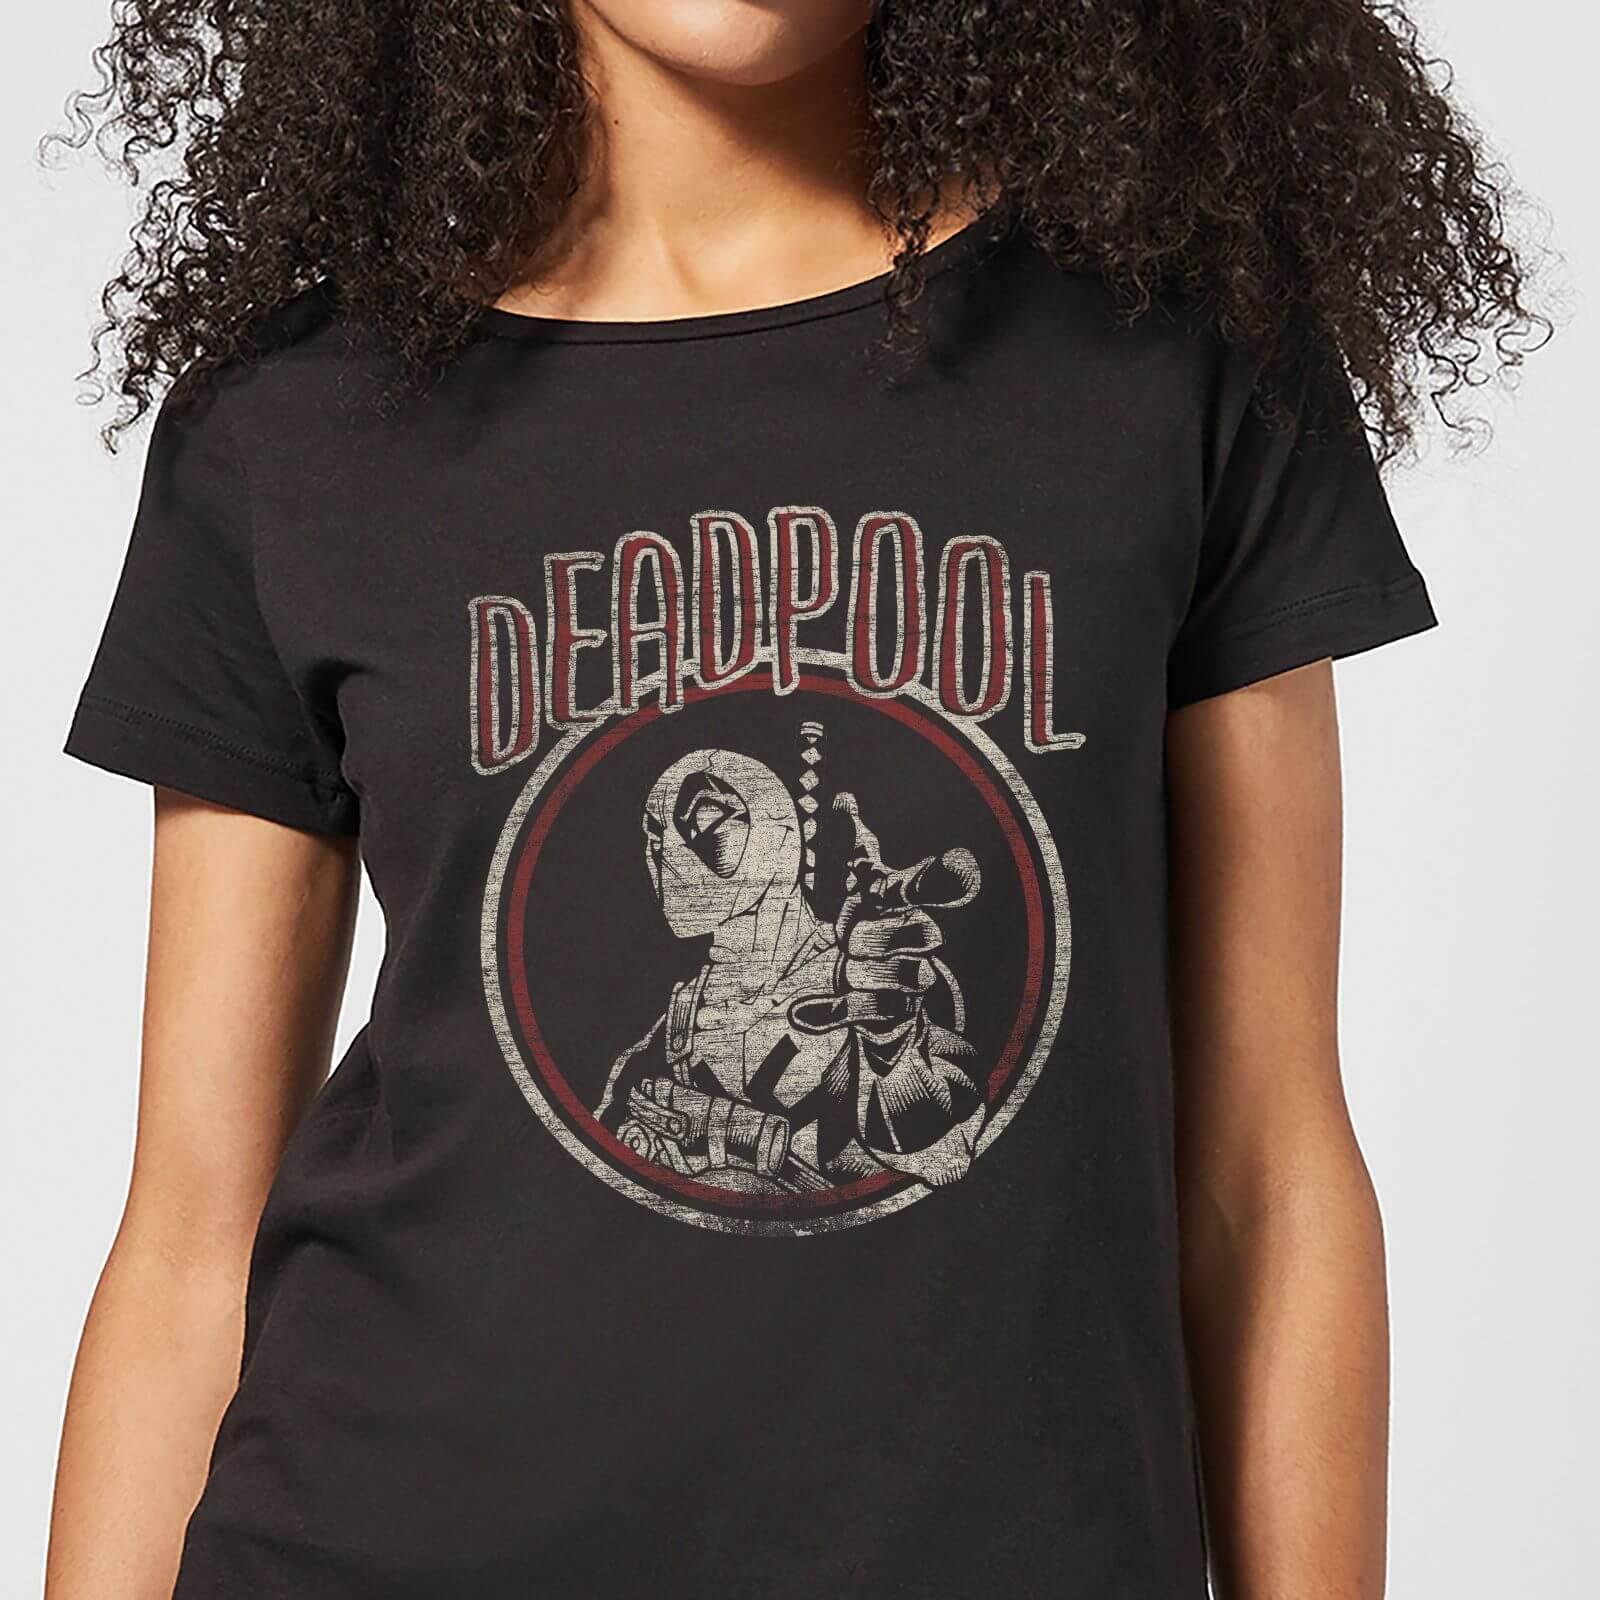 Marvel Deadpool Vintage Circle Women's T-Shirt - Black - XS - Black